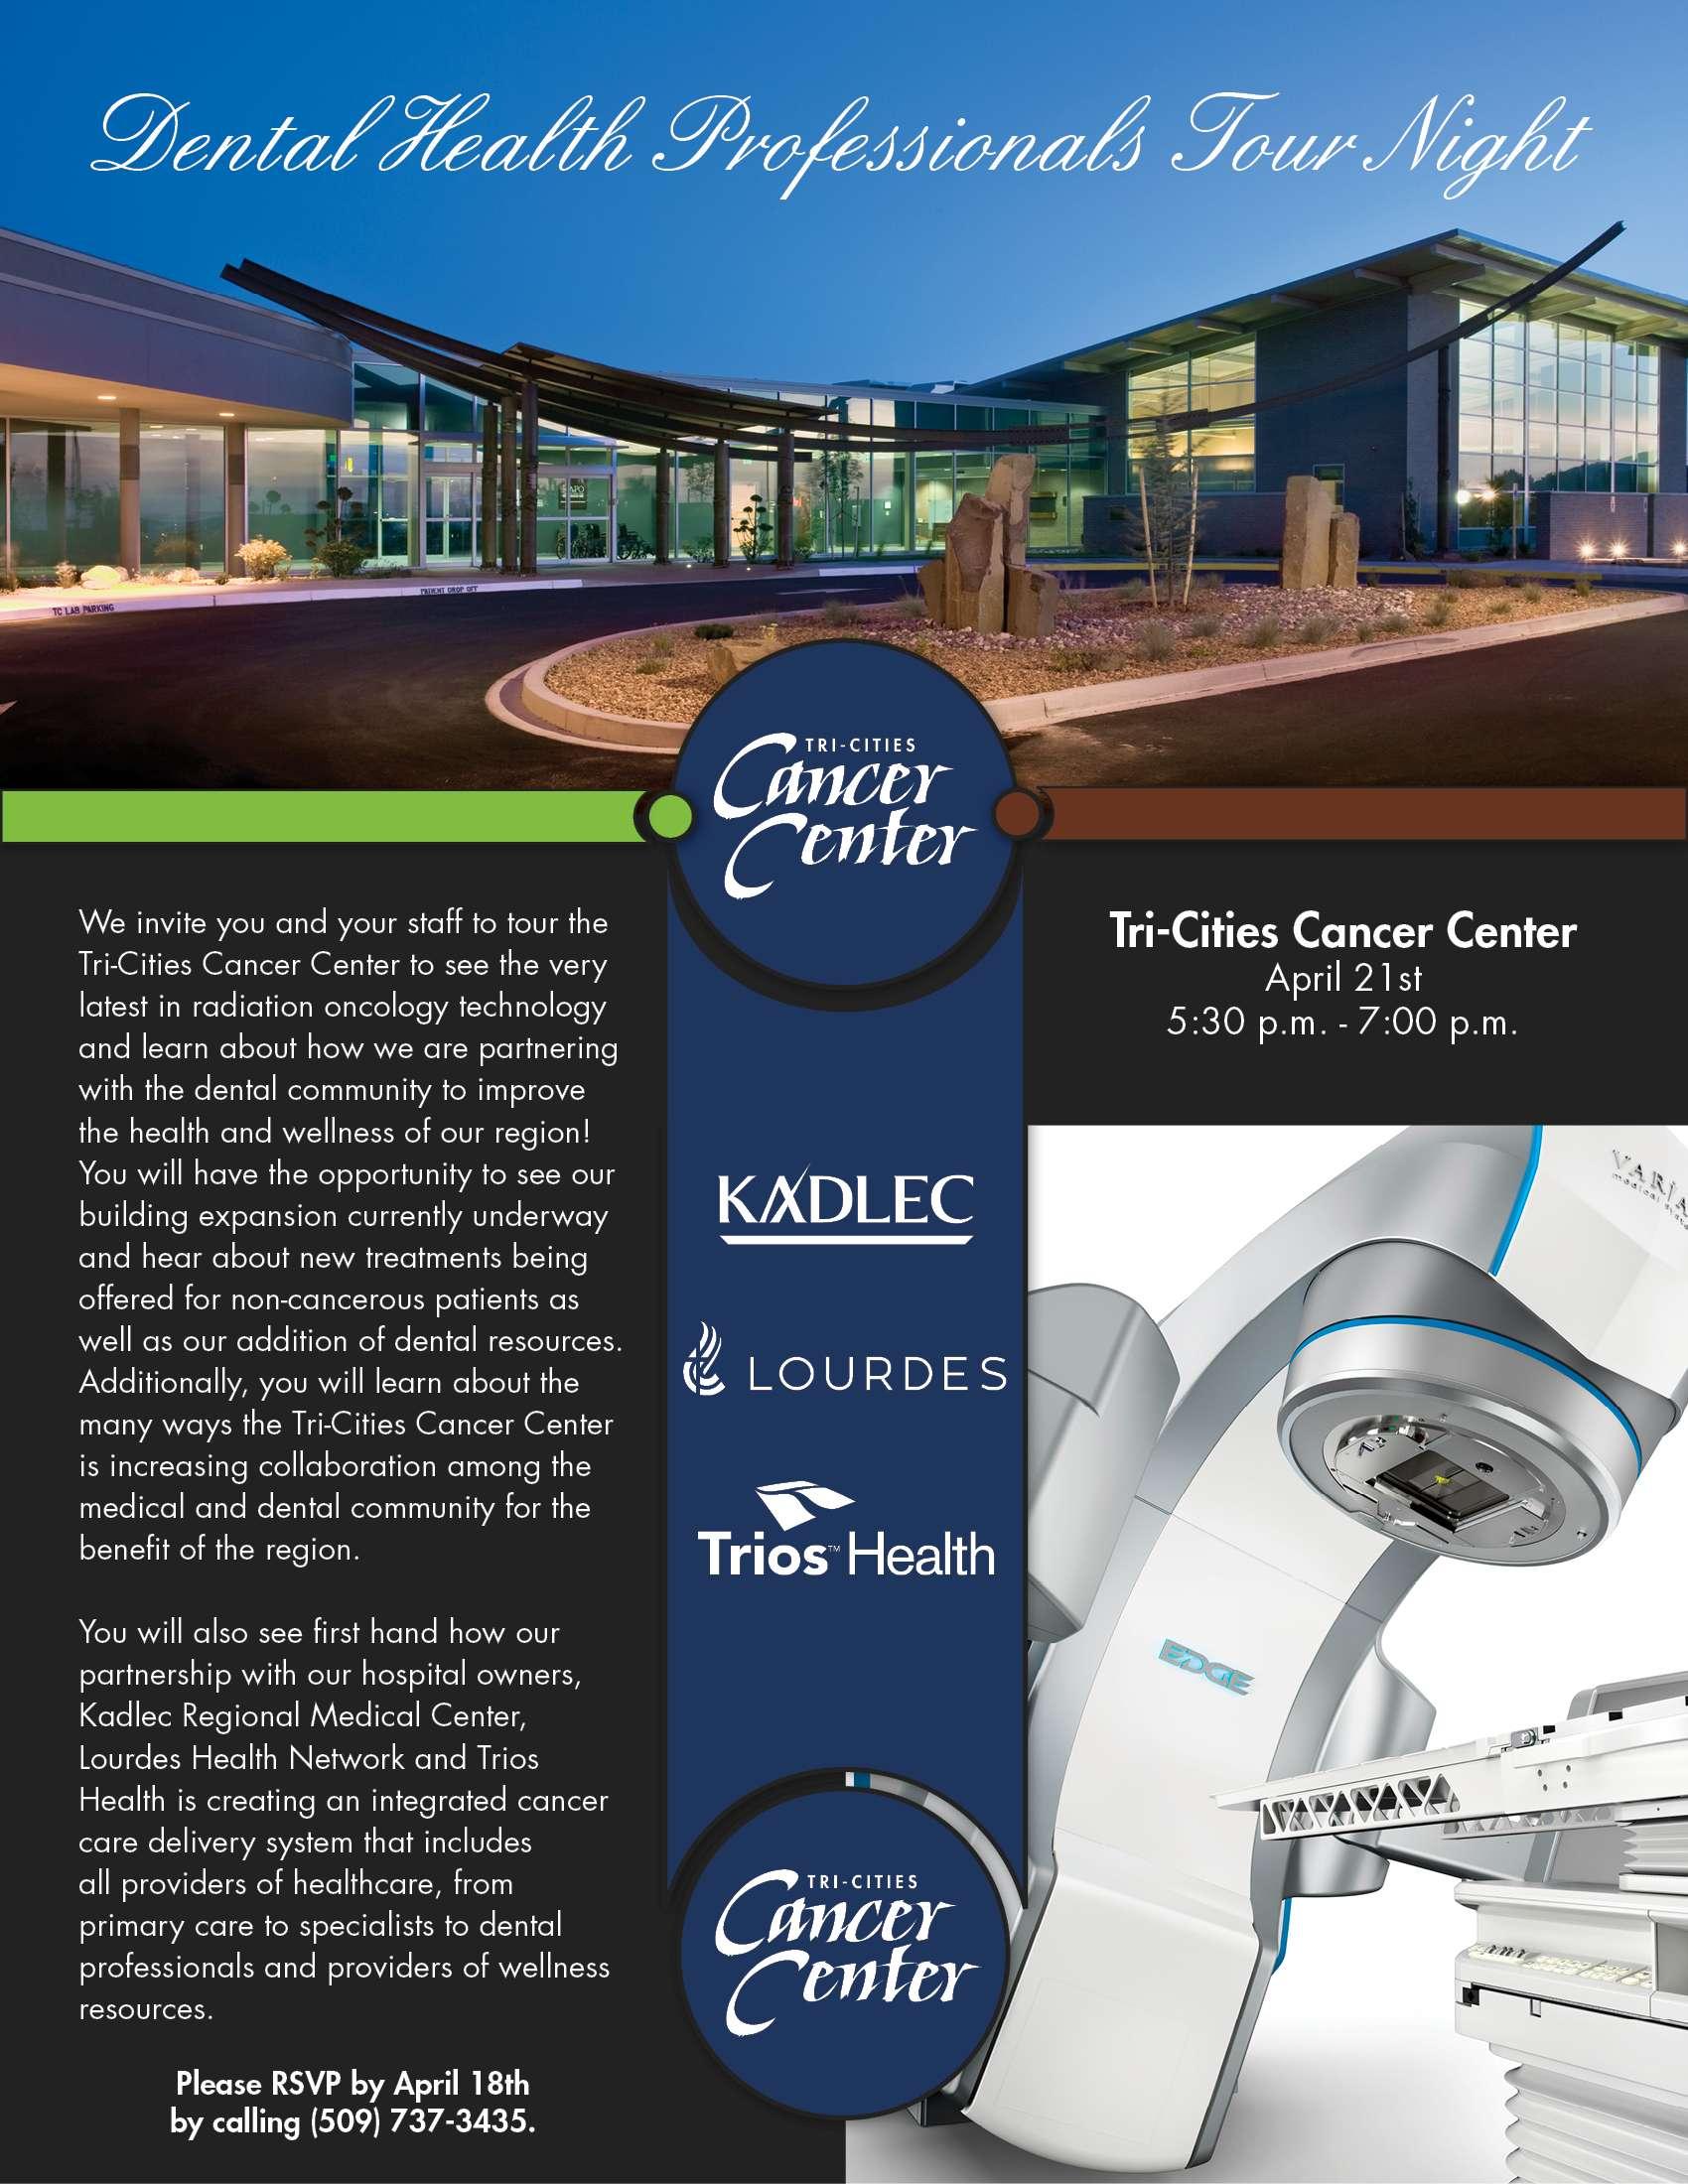 Dental Health Professionals Tour Night Flyer